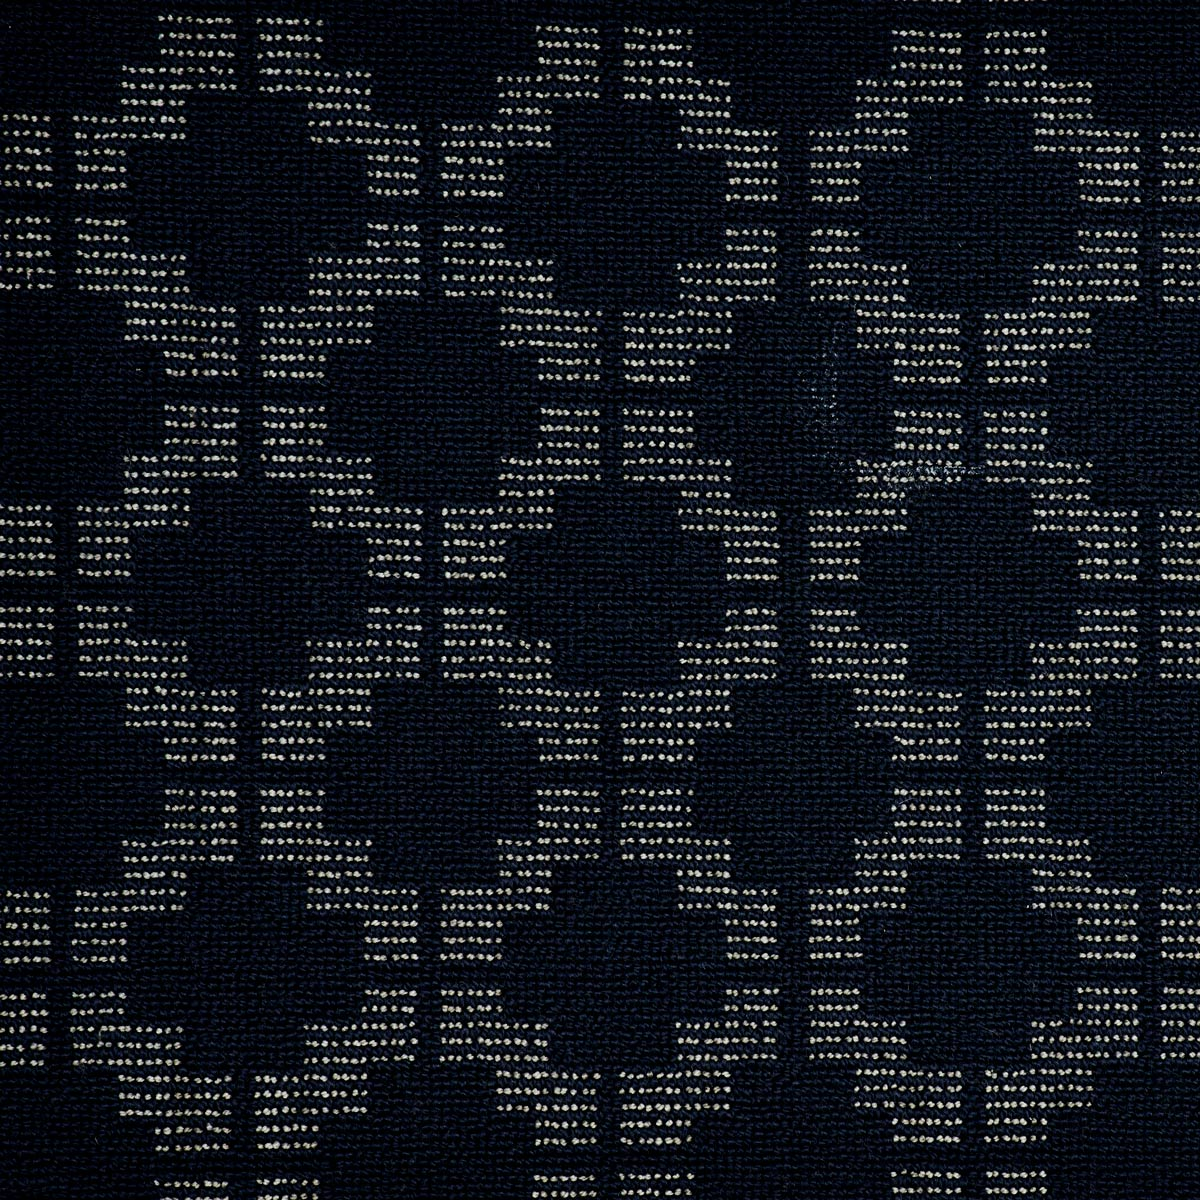 gatekeeper_wool-faux-silk_broadloom_patterson-flynn-martin_pfm